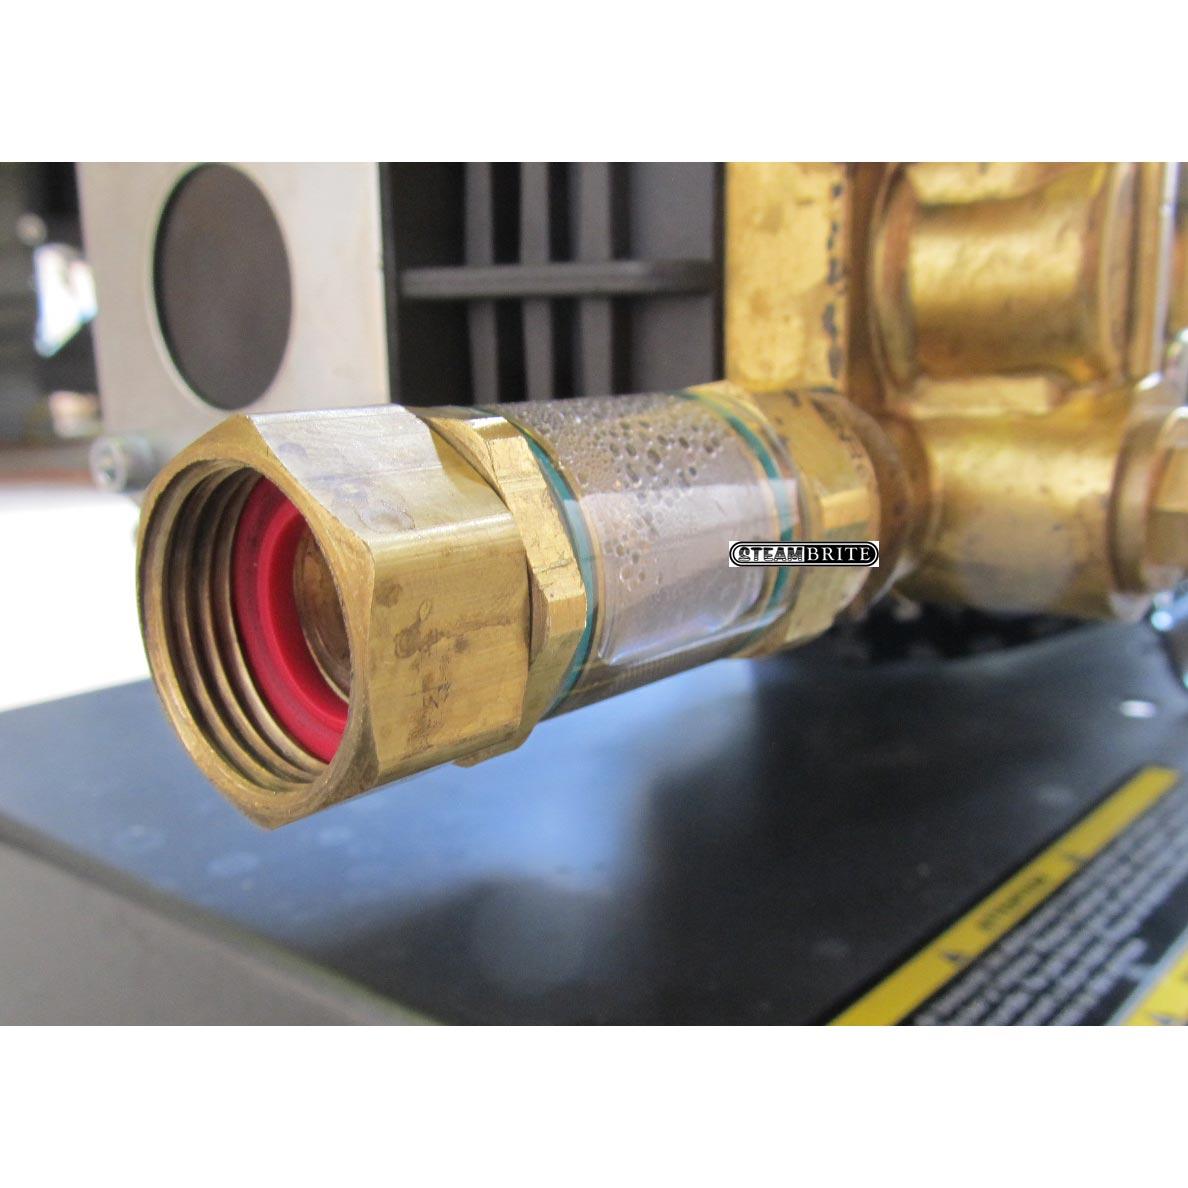 General Pump Inlet Water Filter 3 8 Mip Npt X 3 4 Garden Hose Swivel 8 710 145 0 8 710 145 0